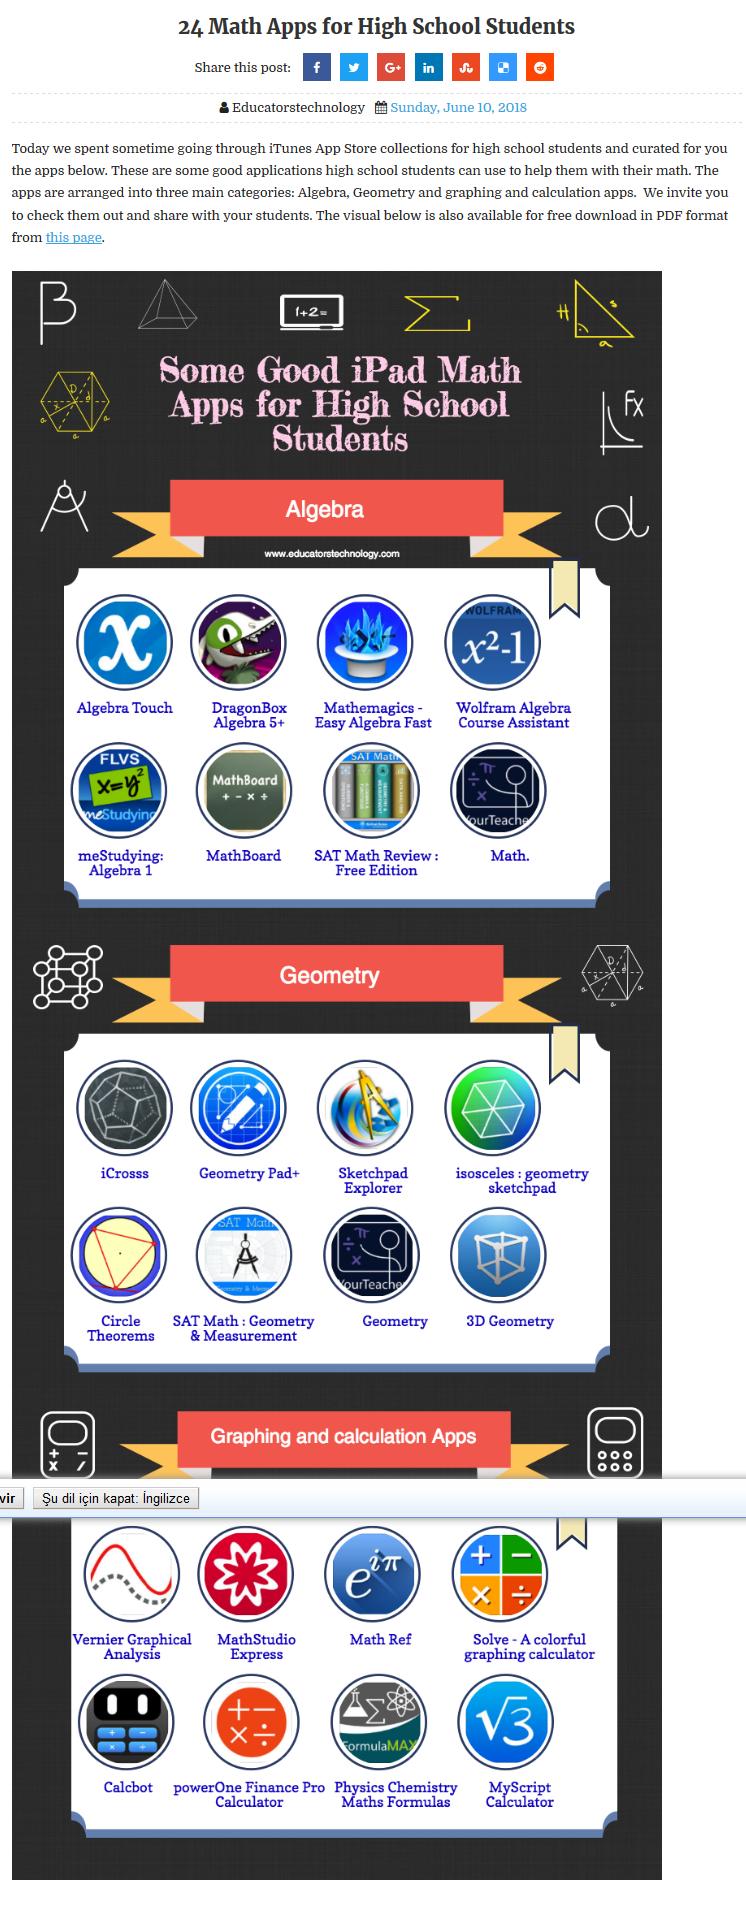 Ekran görüntüsü 24 Math Apps for High School Students